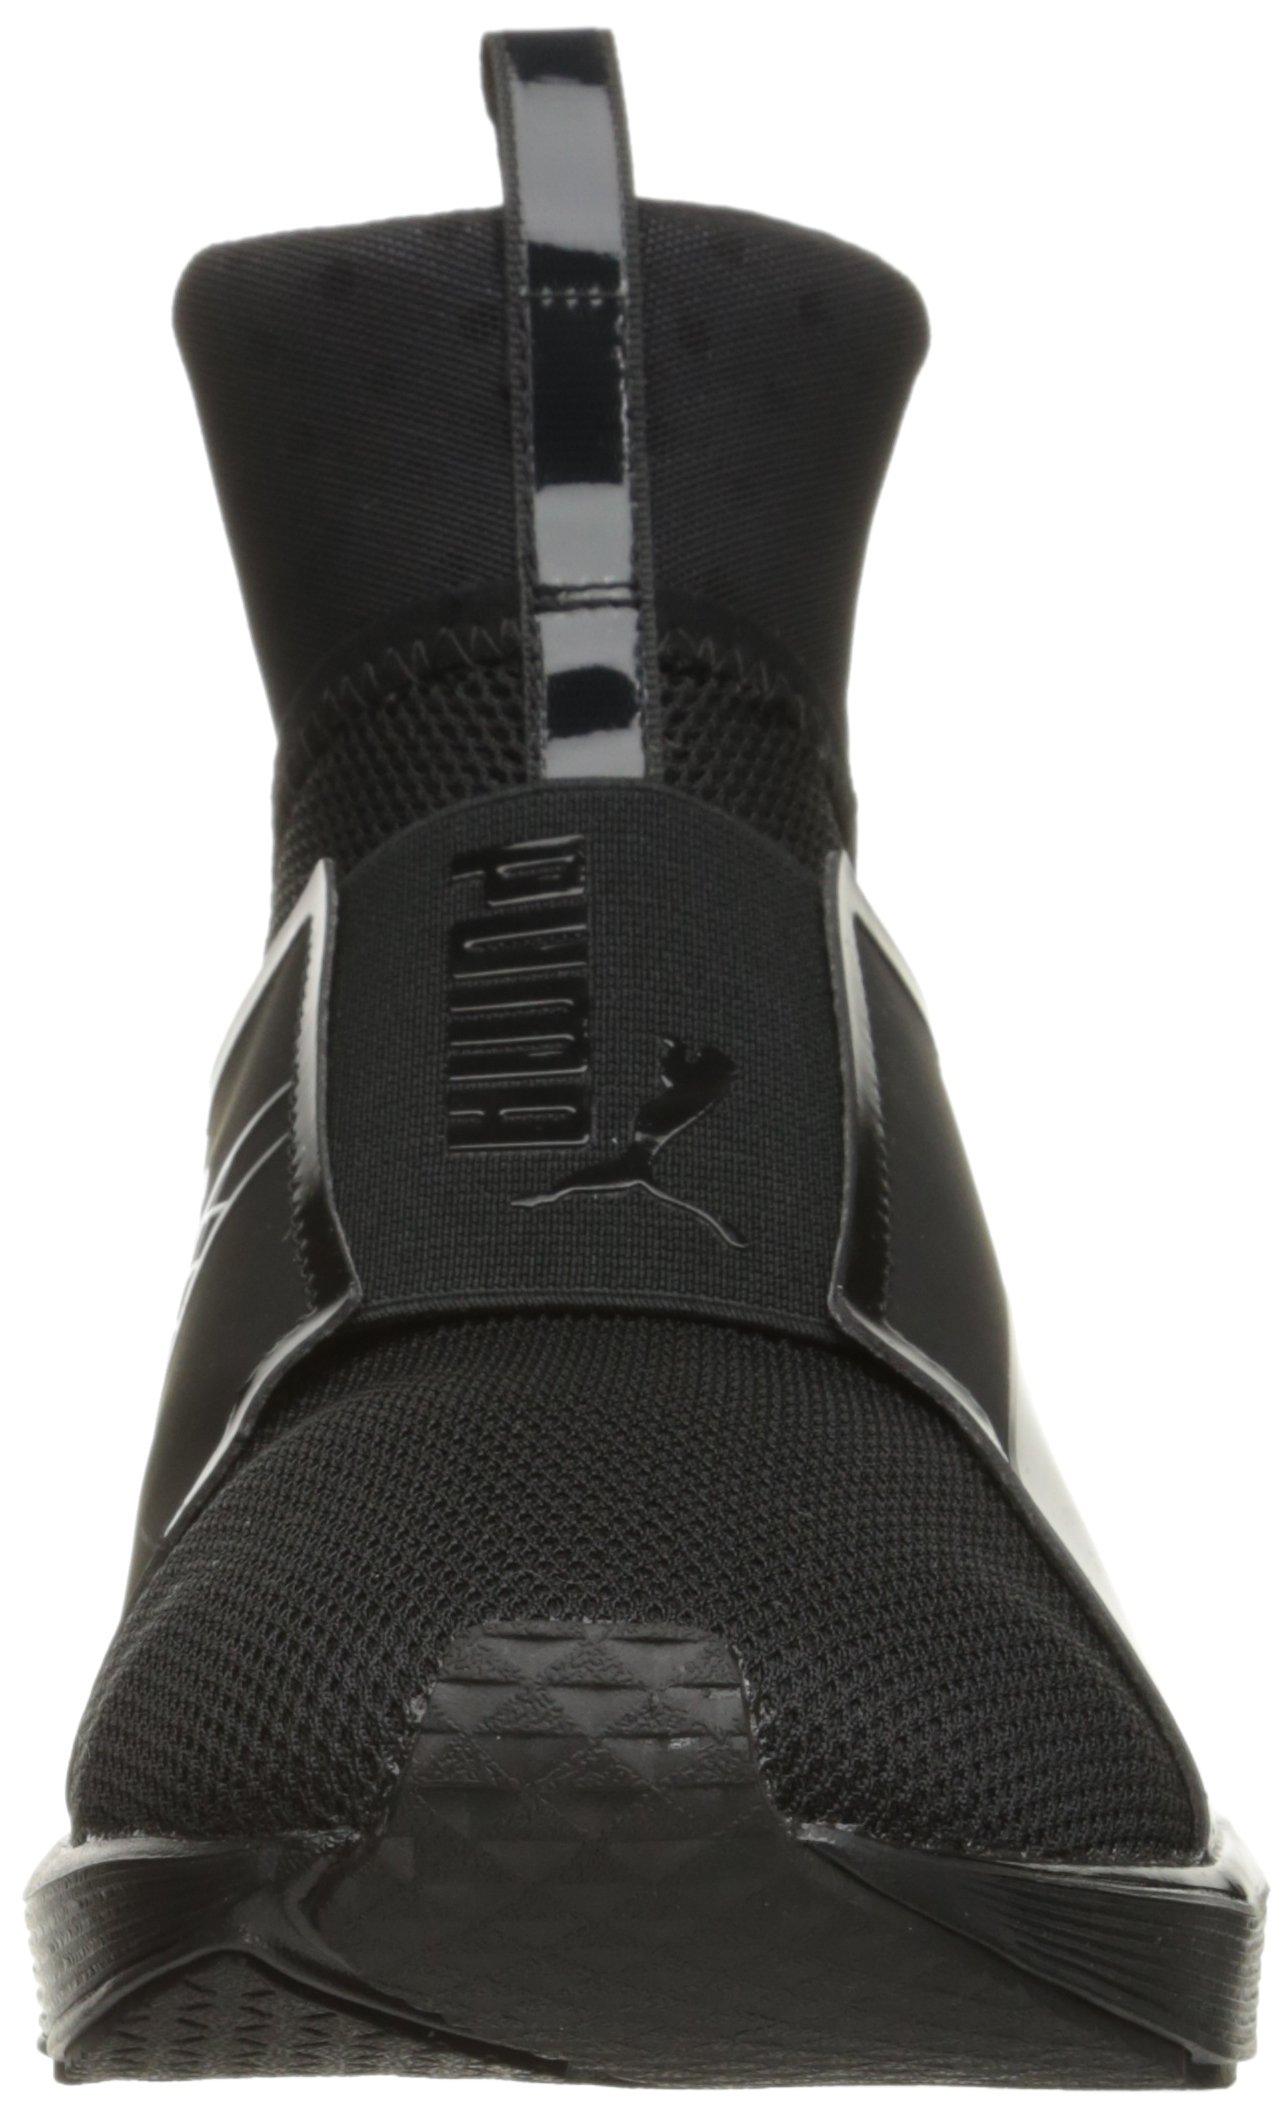 PUMA Women's Fierce Core Cross-Trainer Shoe, Black Black, 9 M US by PUMA (Image #4)